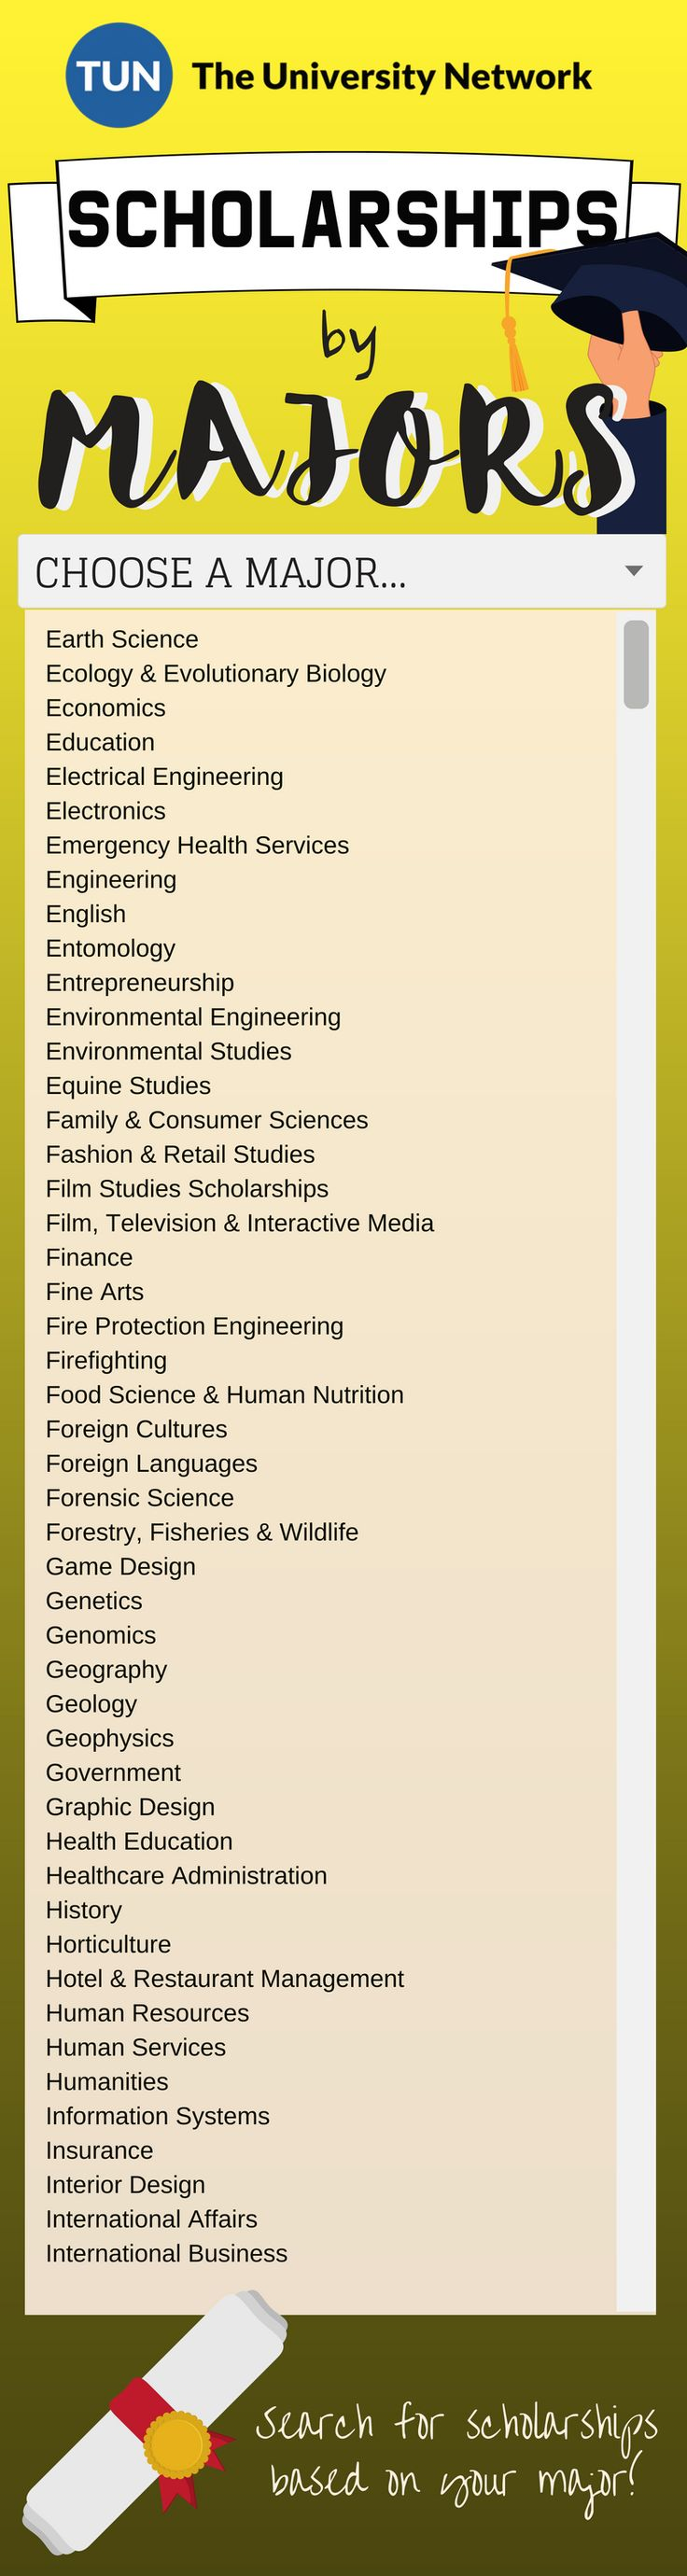 #scholarships #scholarships #college #majors #byScholarships by Majors